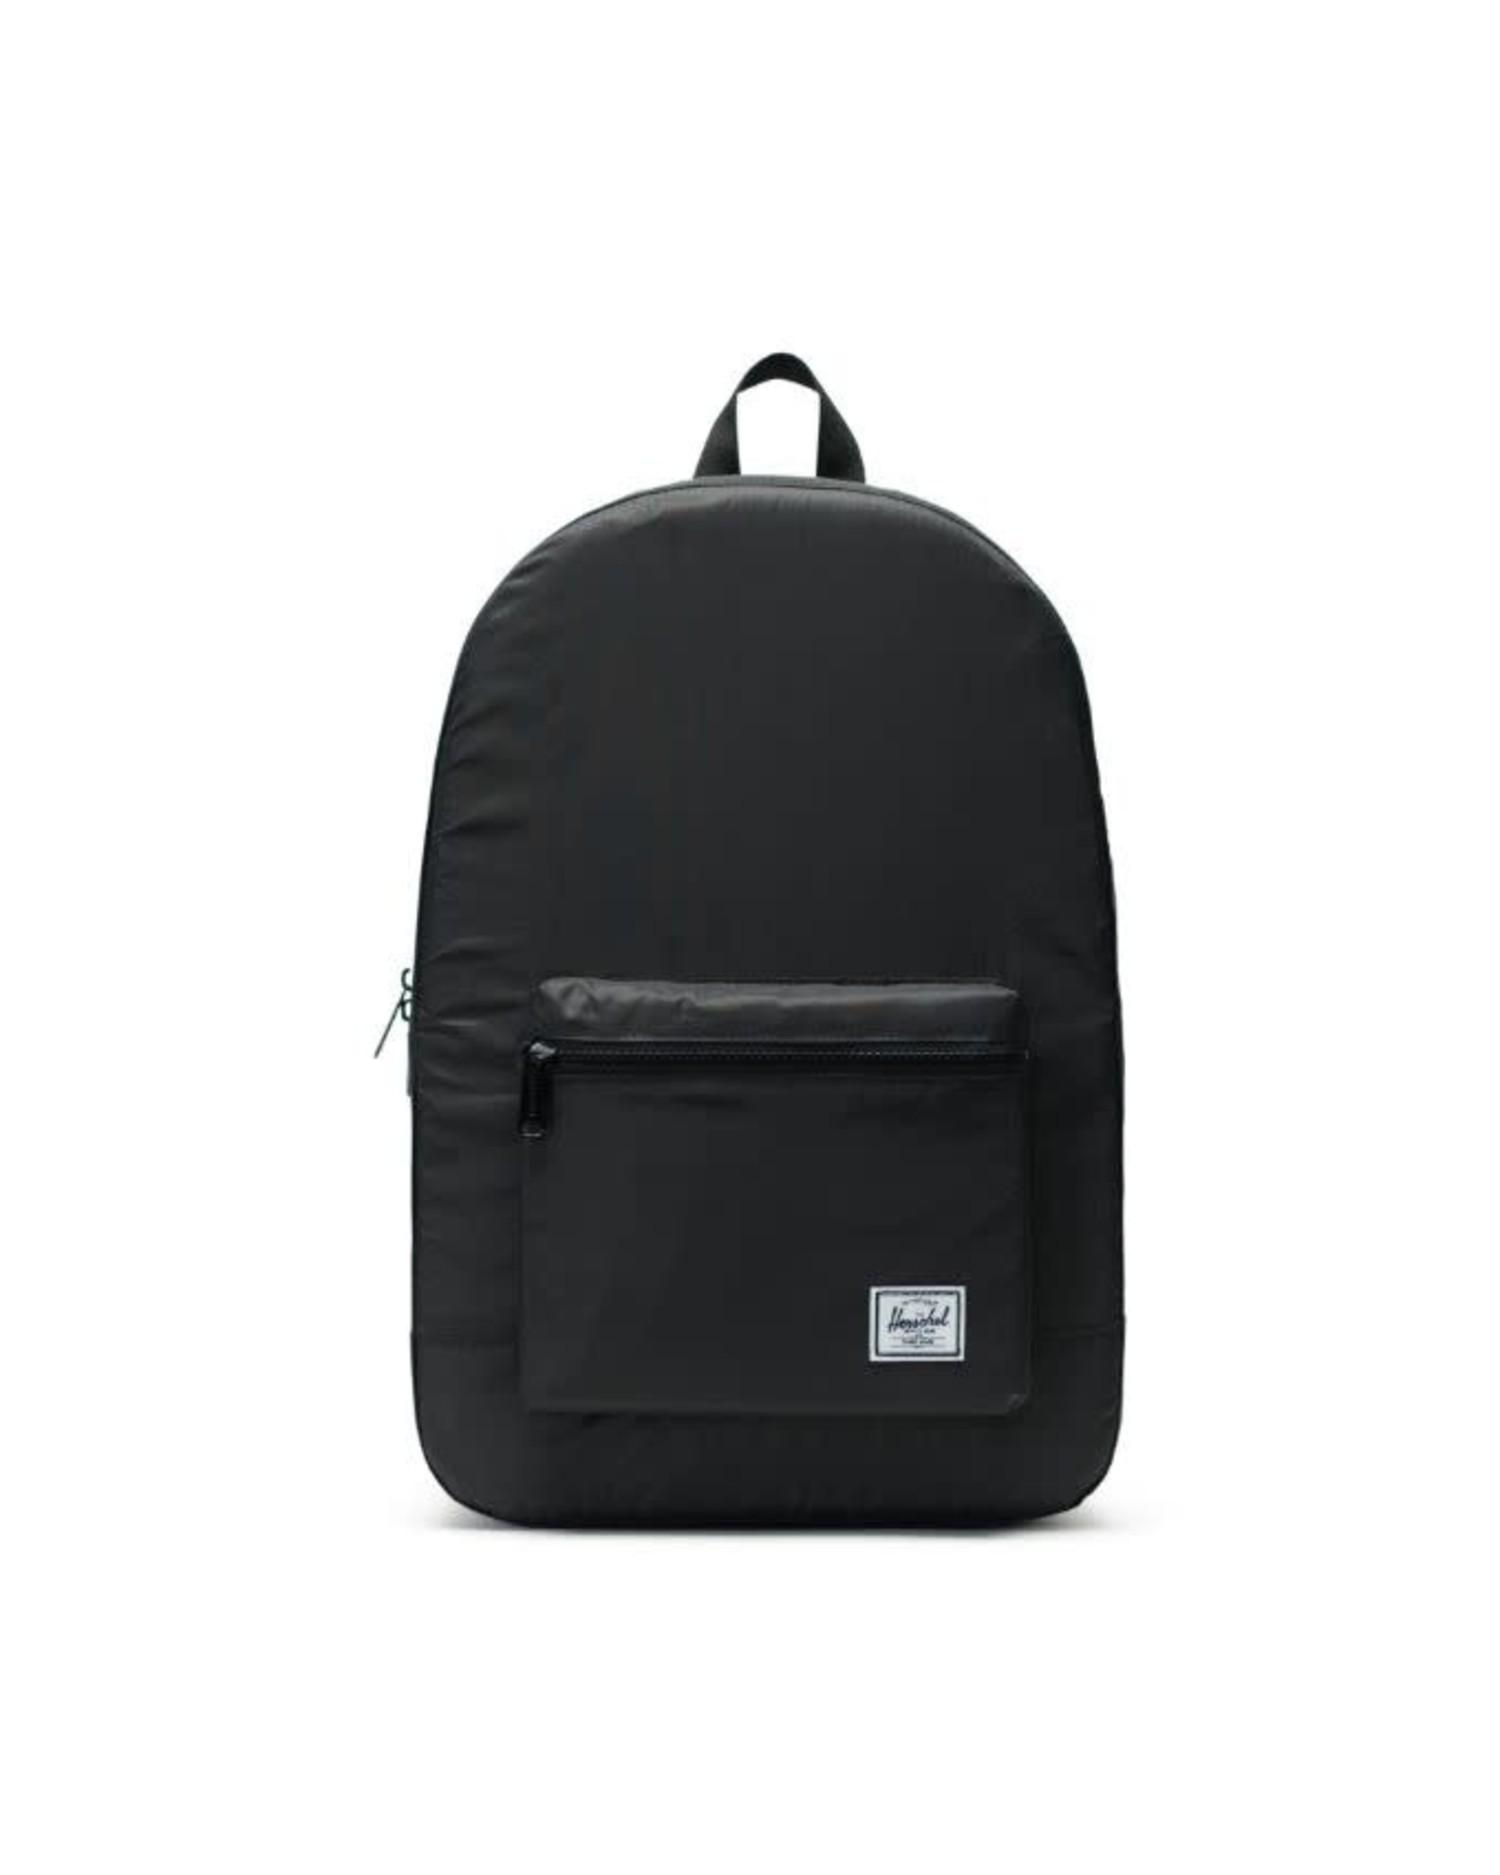 bliżej na ogromna zniżka Los Angeles Herschel Herschel Packable Daypack Backpack